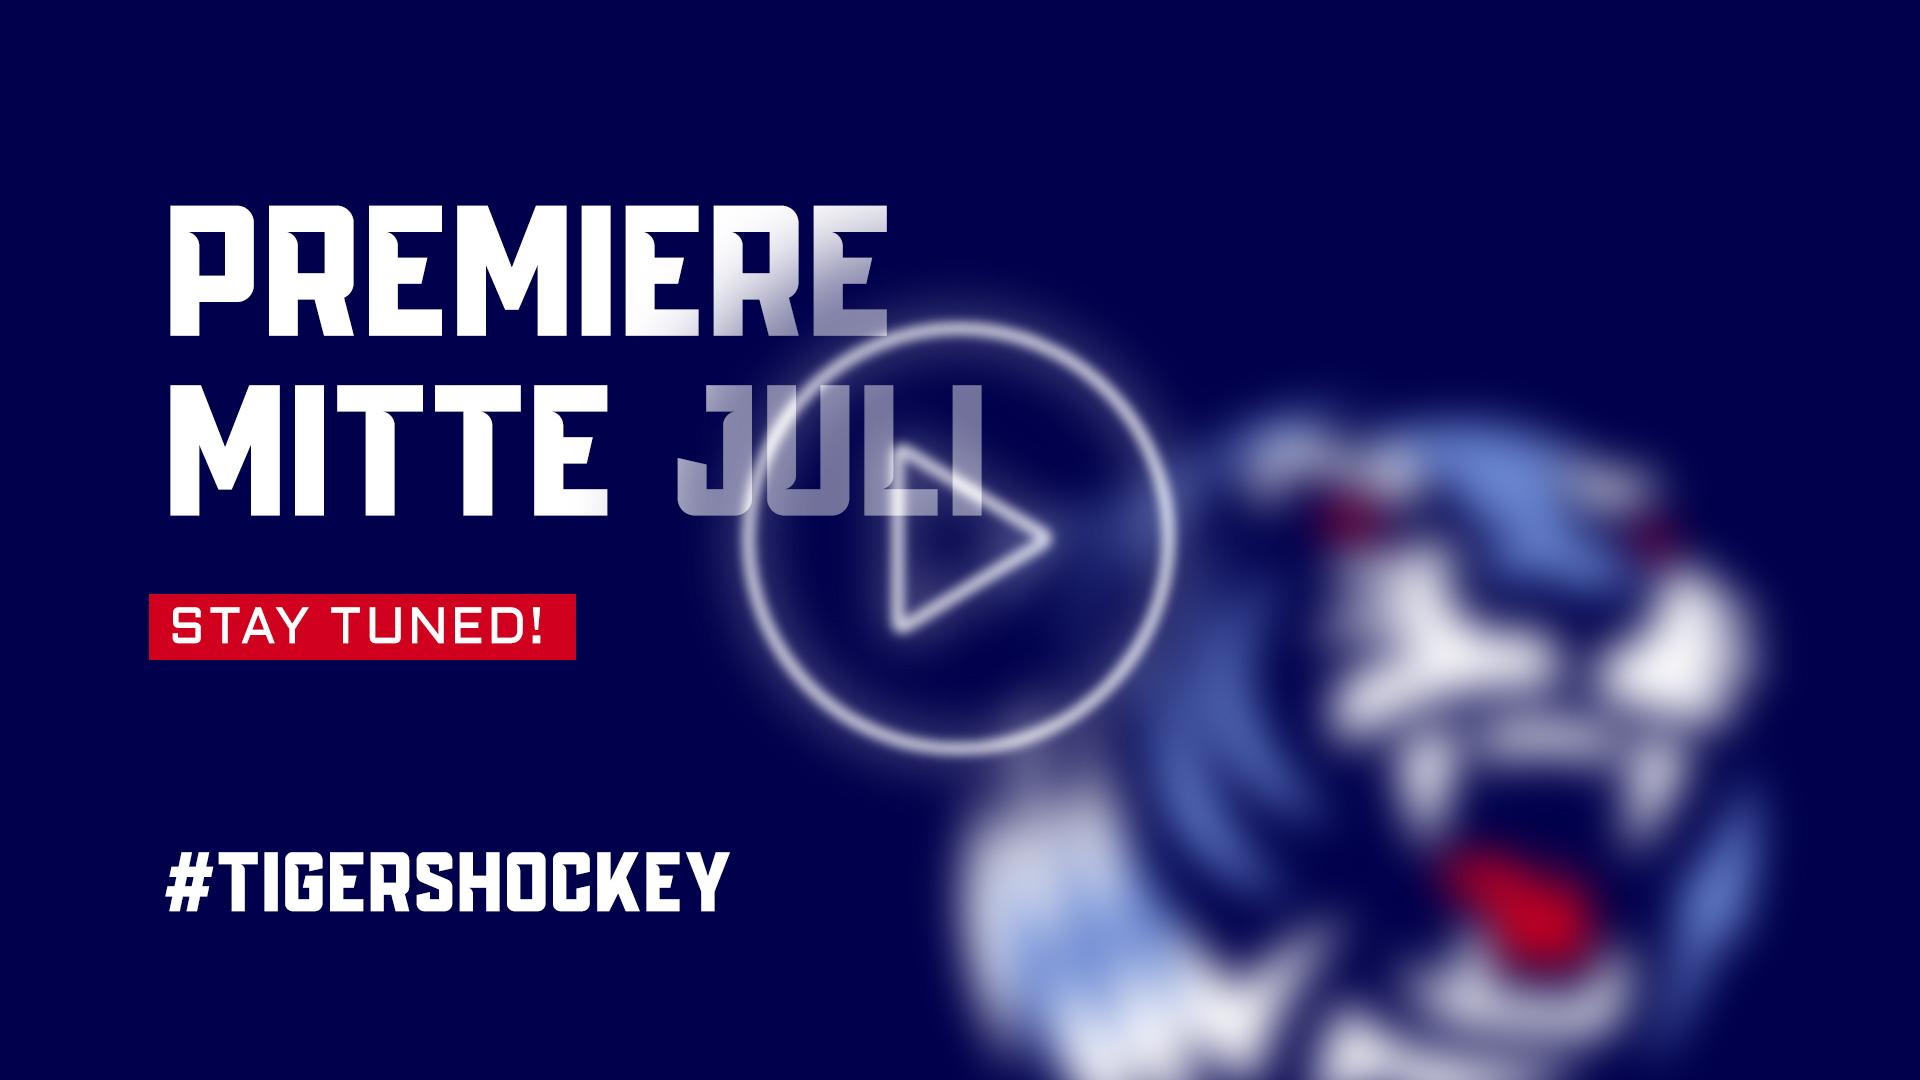 Banner Premiere Mitte Juli - stay tuned!